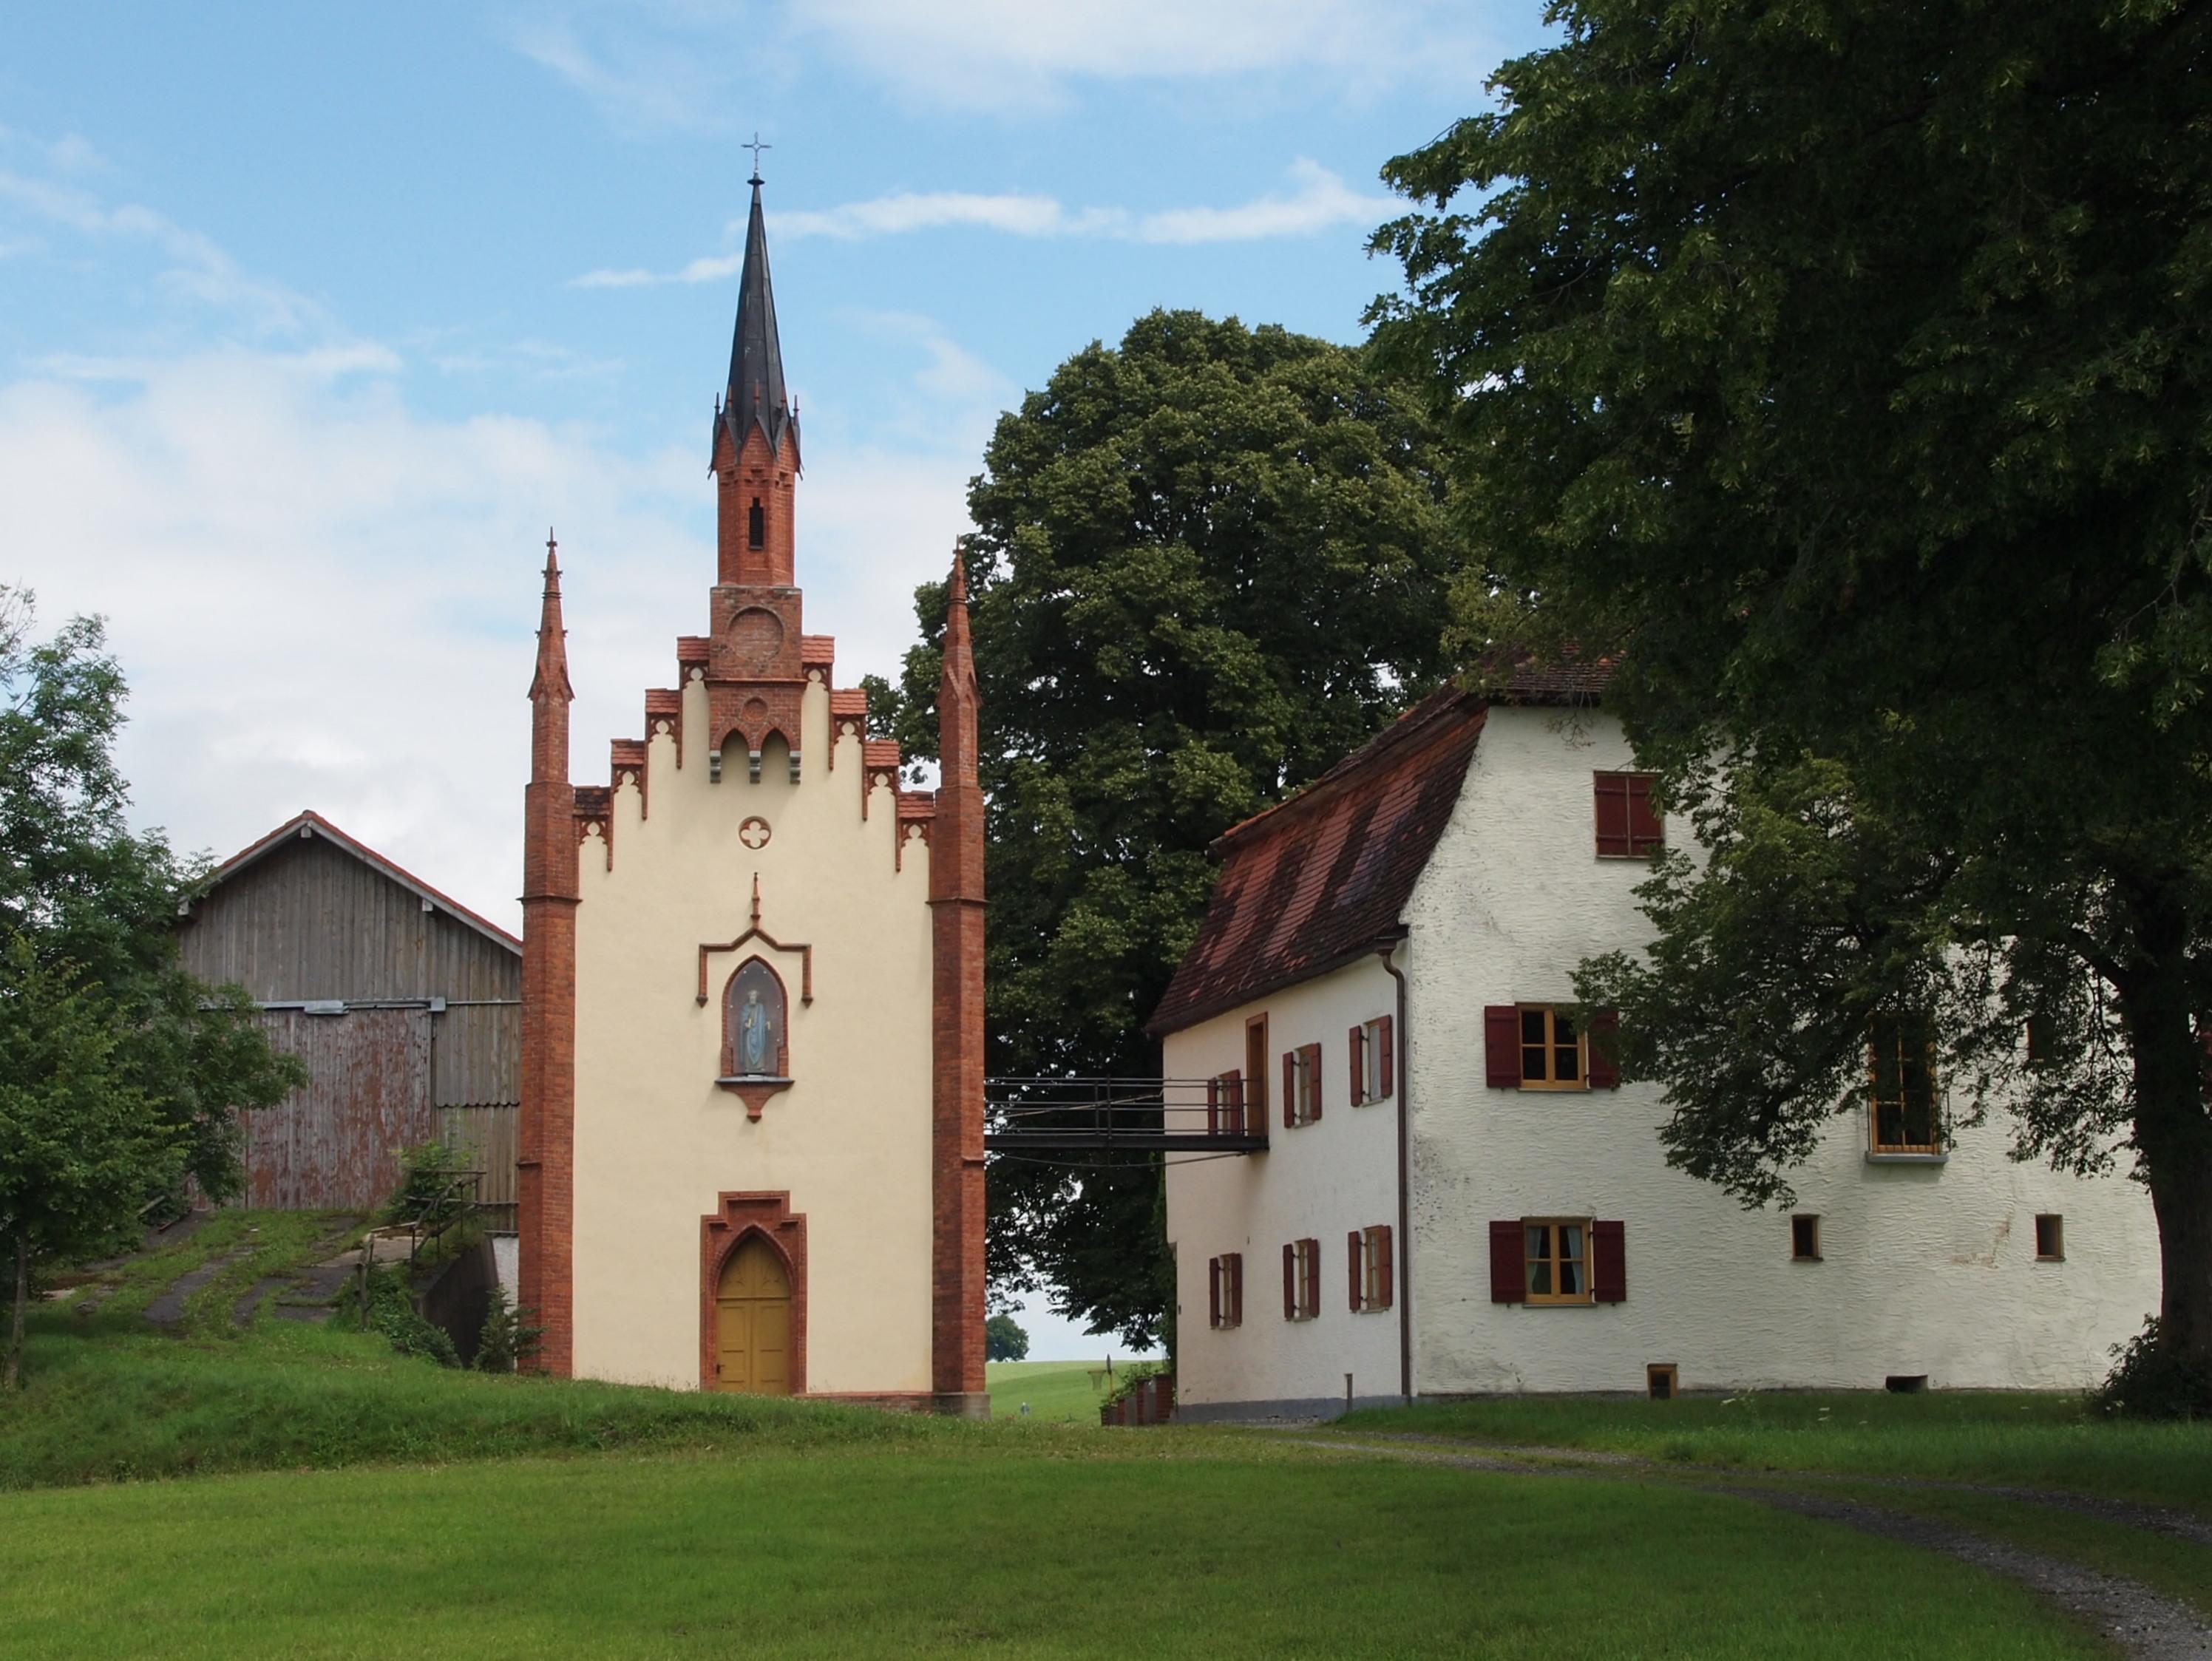 Datei:Rosshaupten Fischhaus (2).JPG – Wikipedia